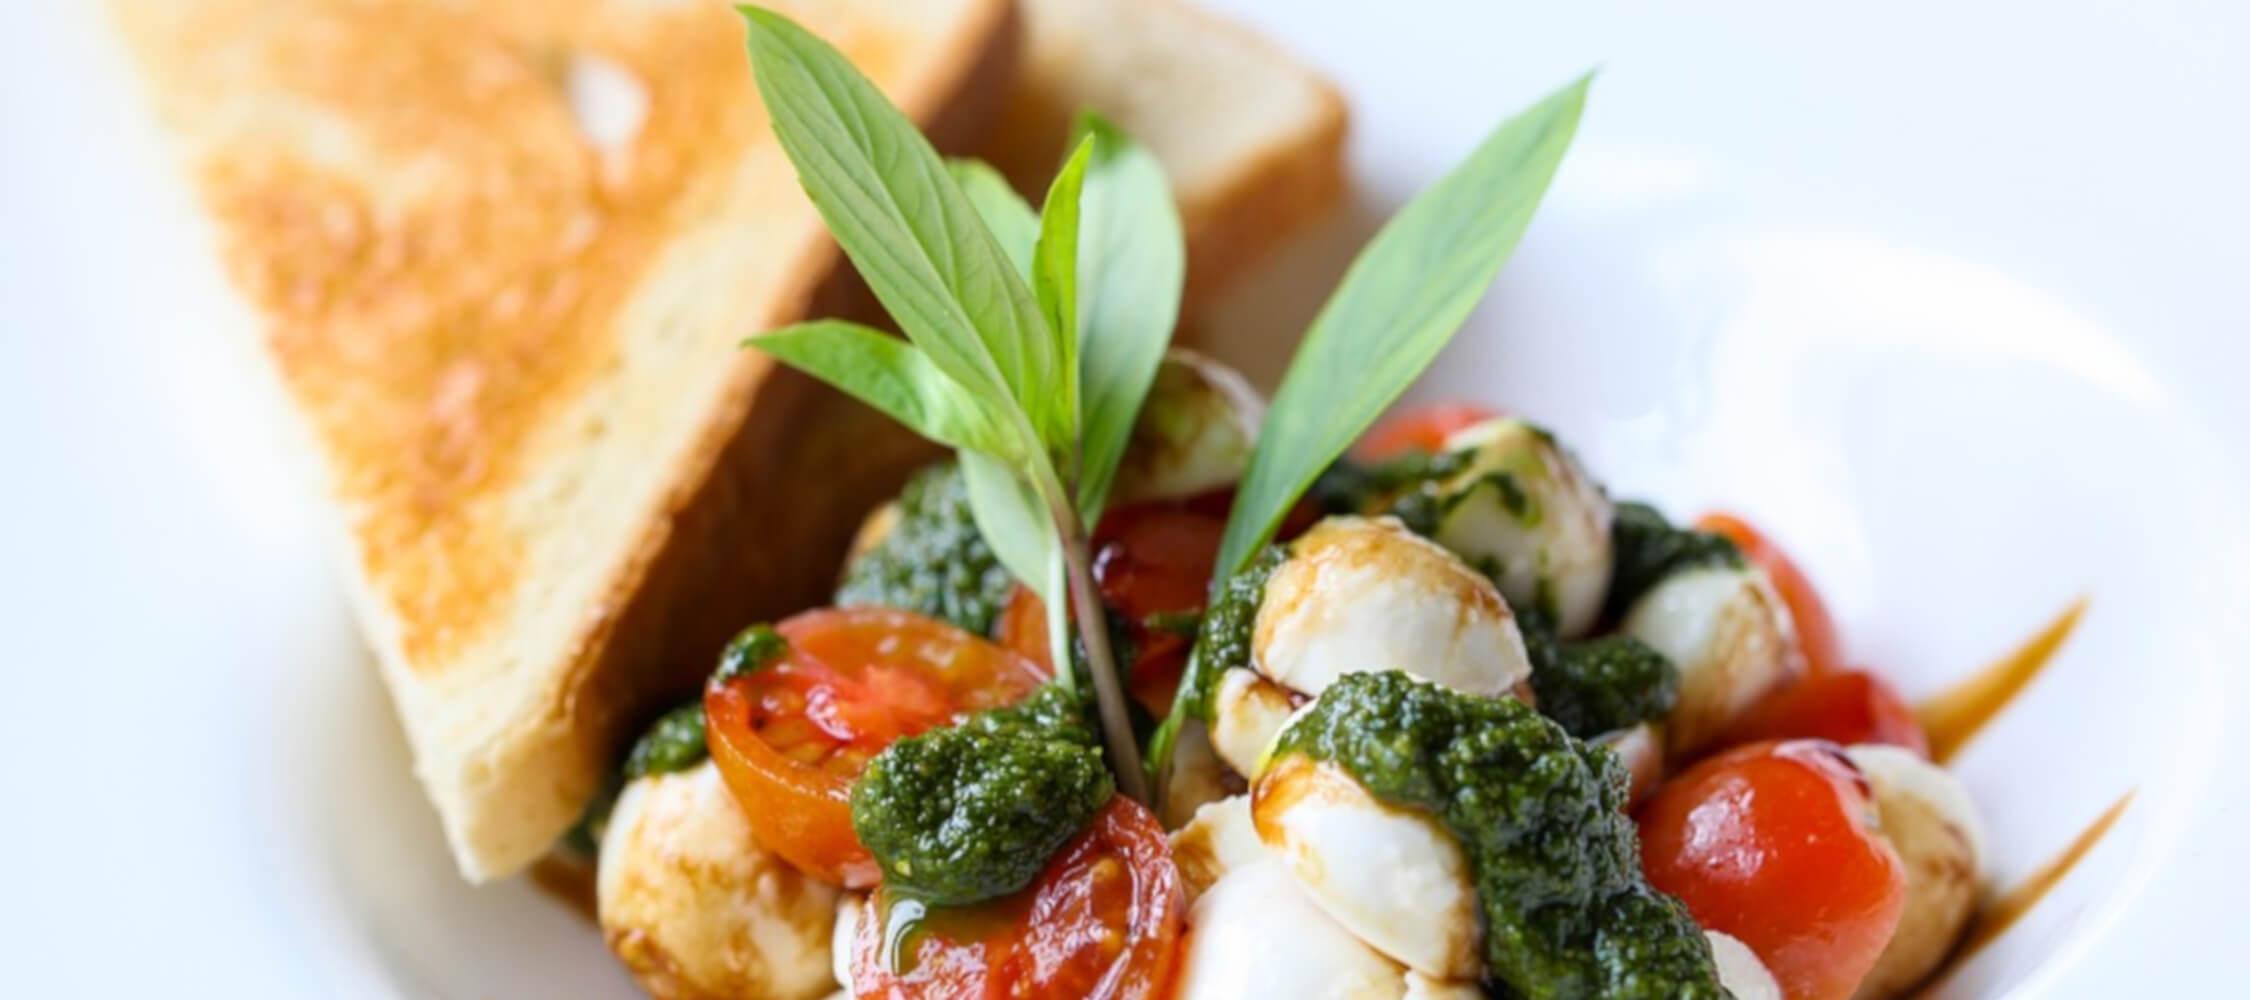 City_Hotel_Merano_Restaurant_City_Dinner_Starter_Nudeln_Gnocchi_2274211_2250x1000